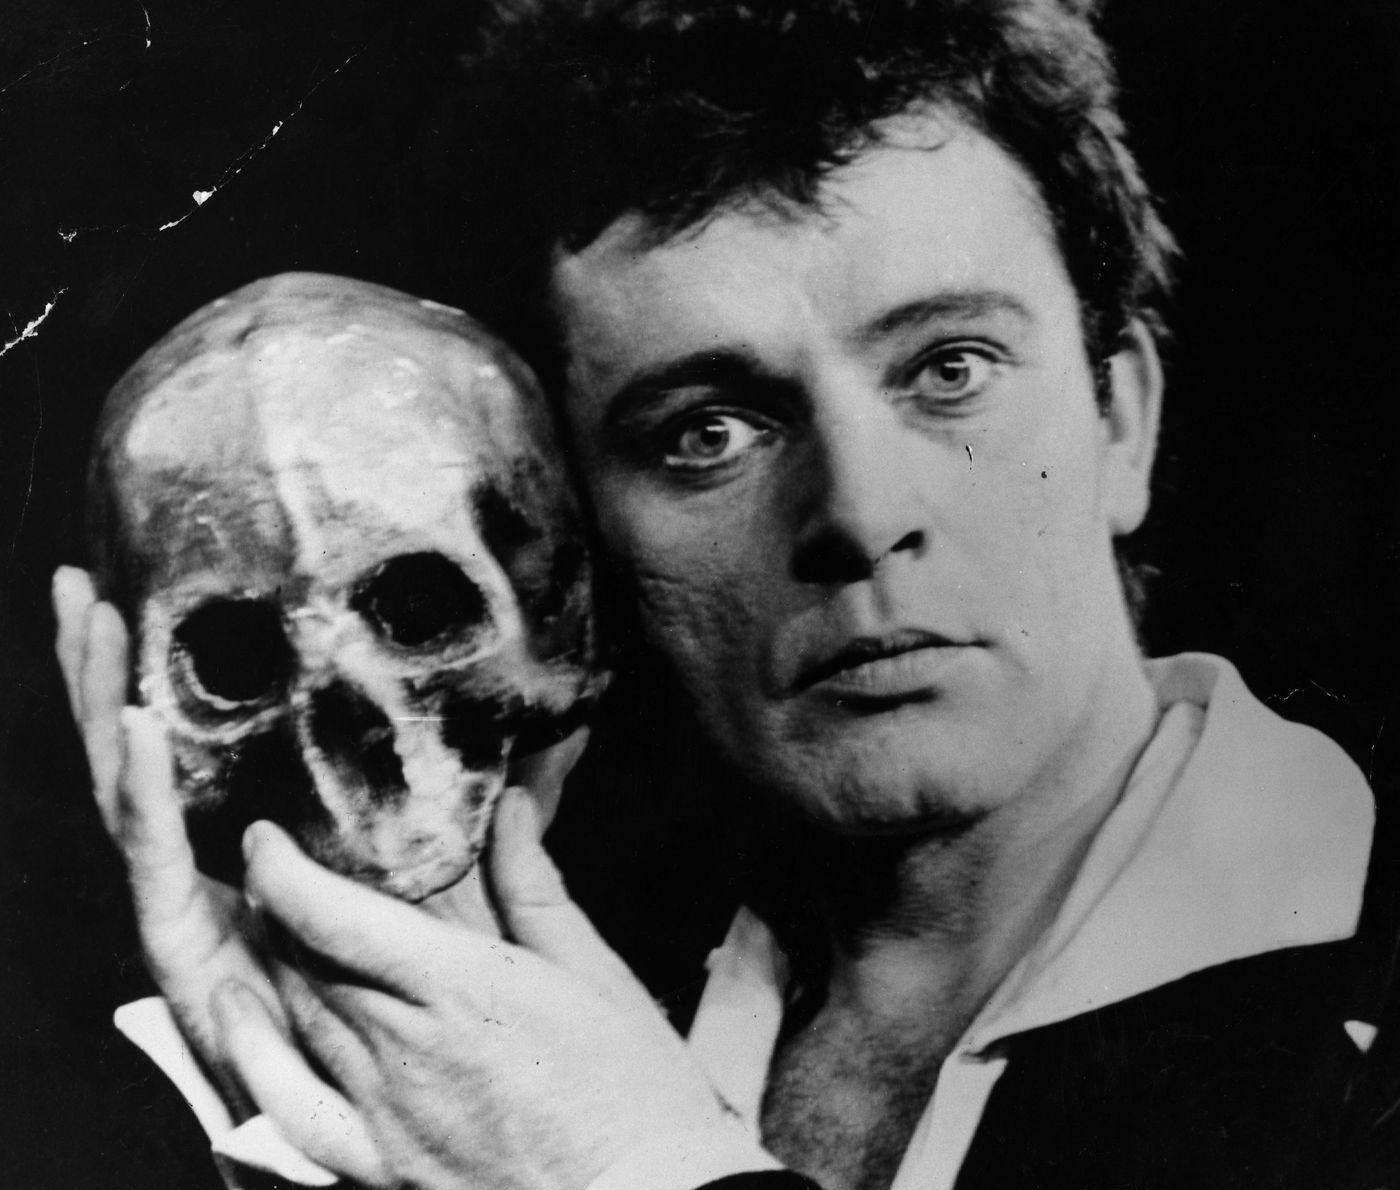 3404362.0.1541790351 e1611747619618 The Remarkable Life Of Richard Burton